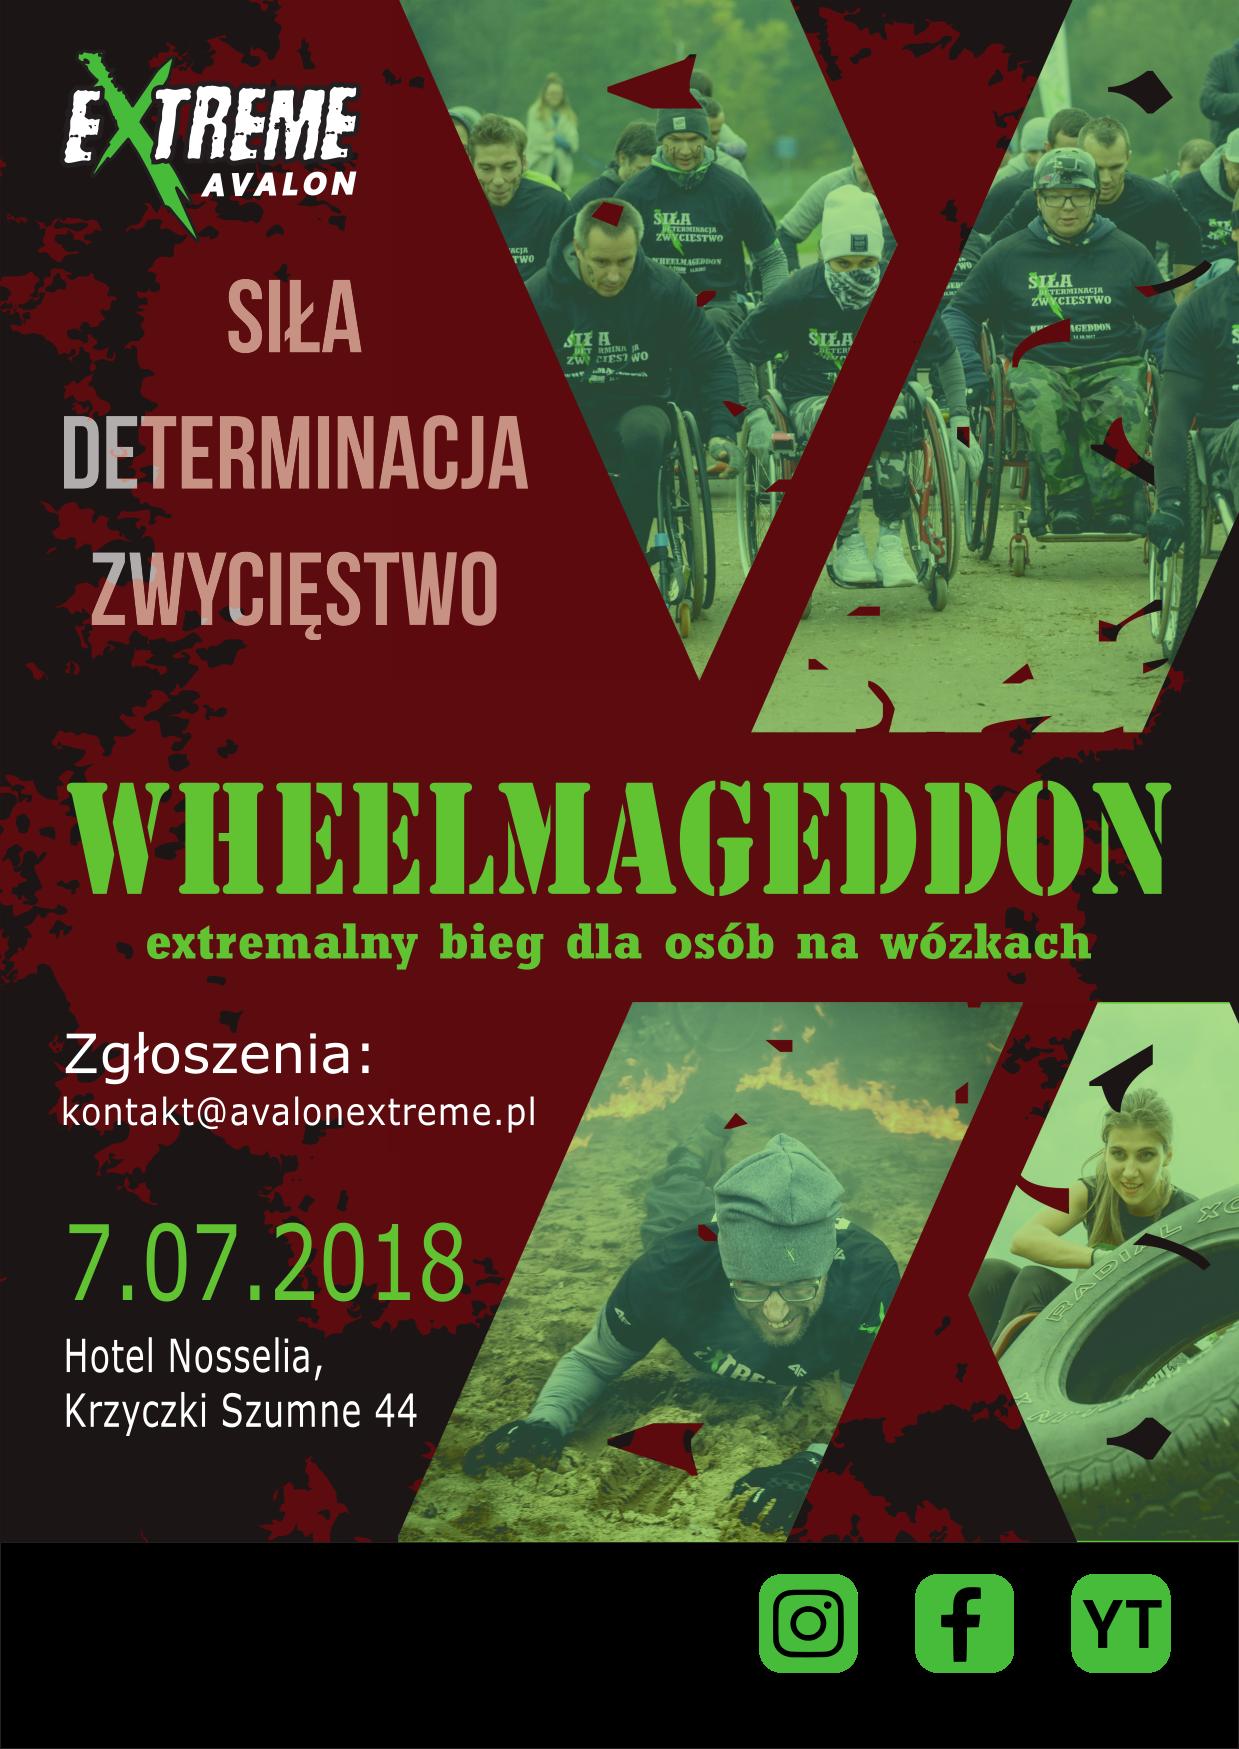 bieg ekstremalny WHEELMAGEDDON 2018